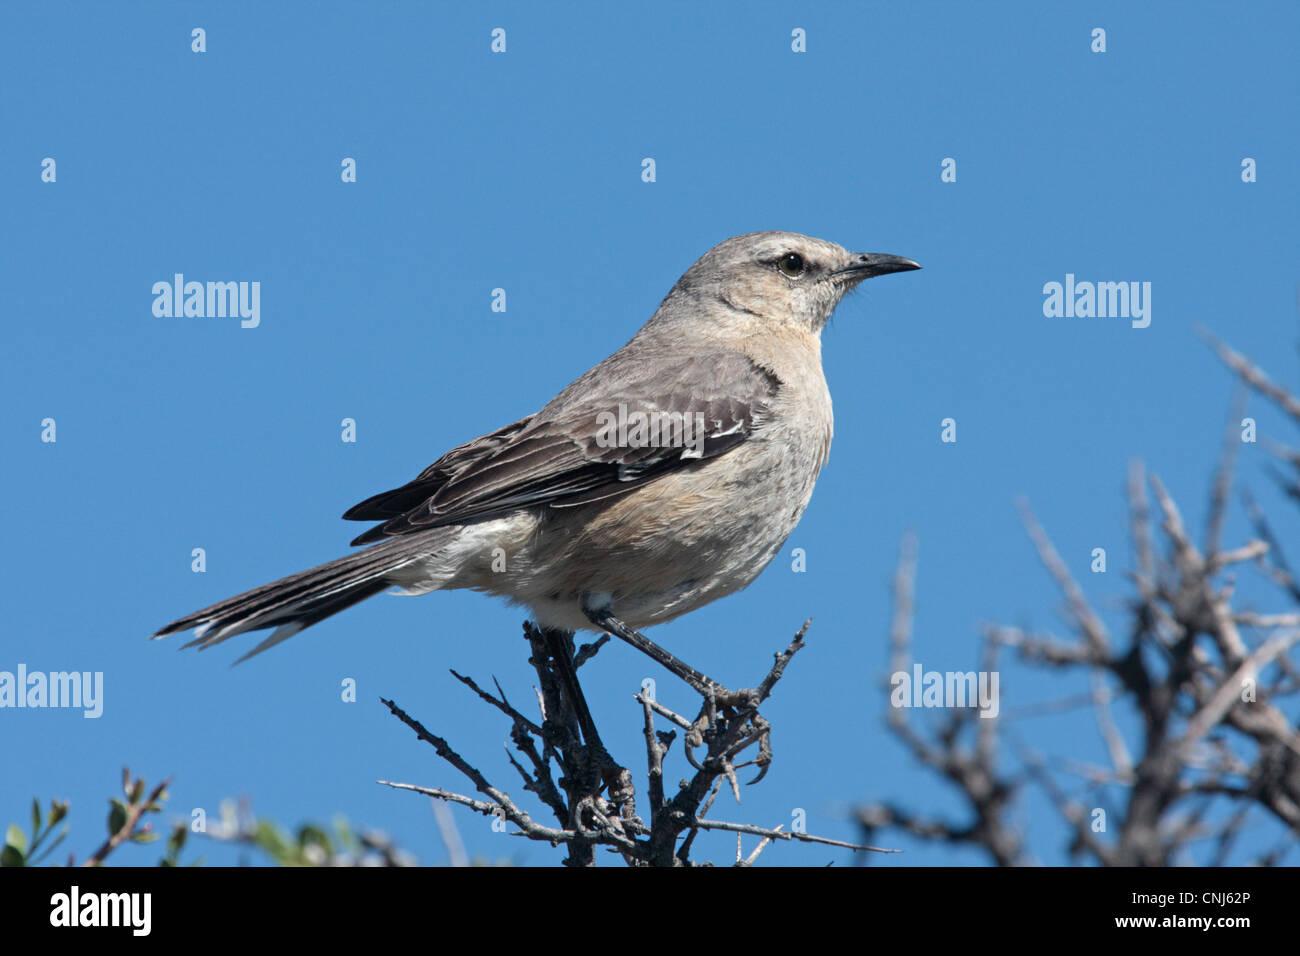 Patagonian Mockingbird Mimus Patagonicus Adult Perched On Twigs Rio Gallegos Santa